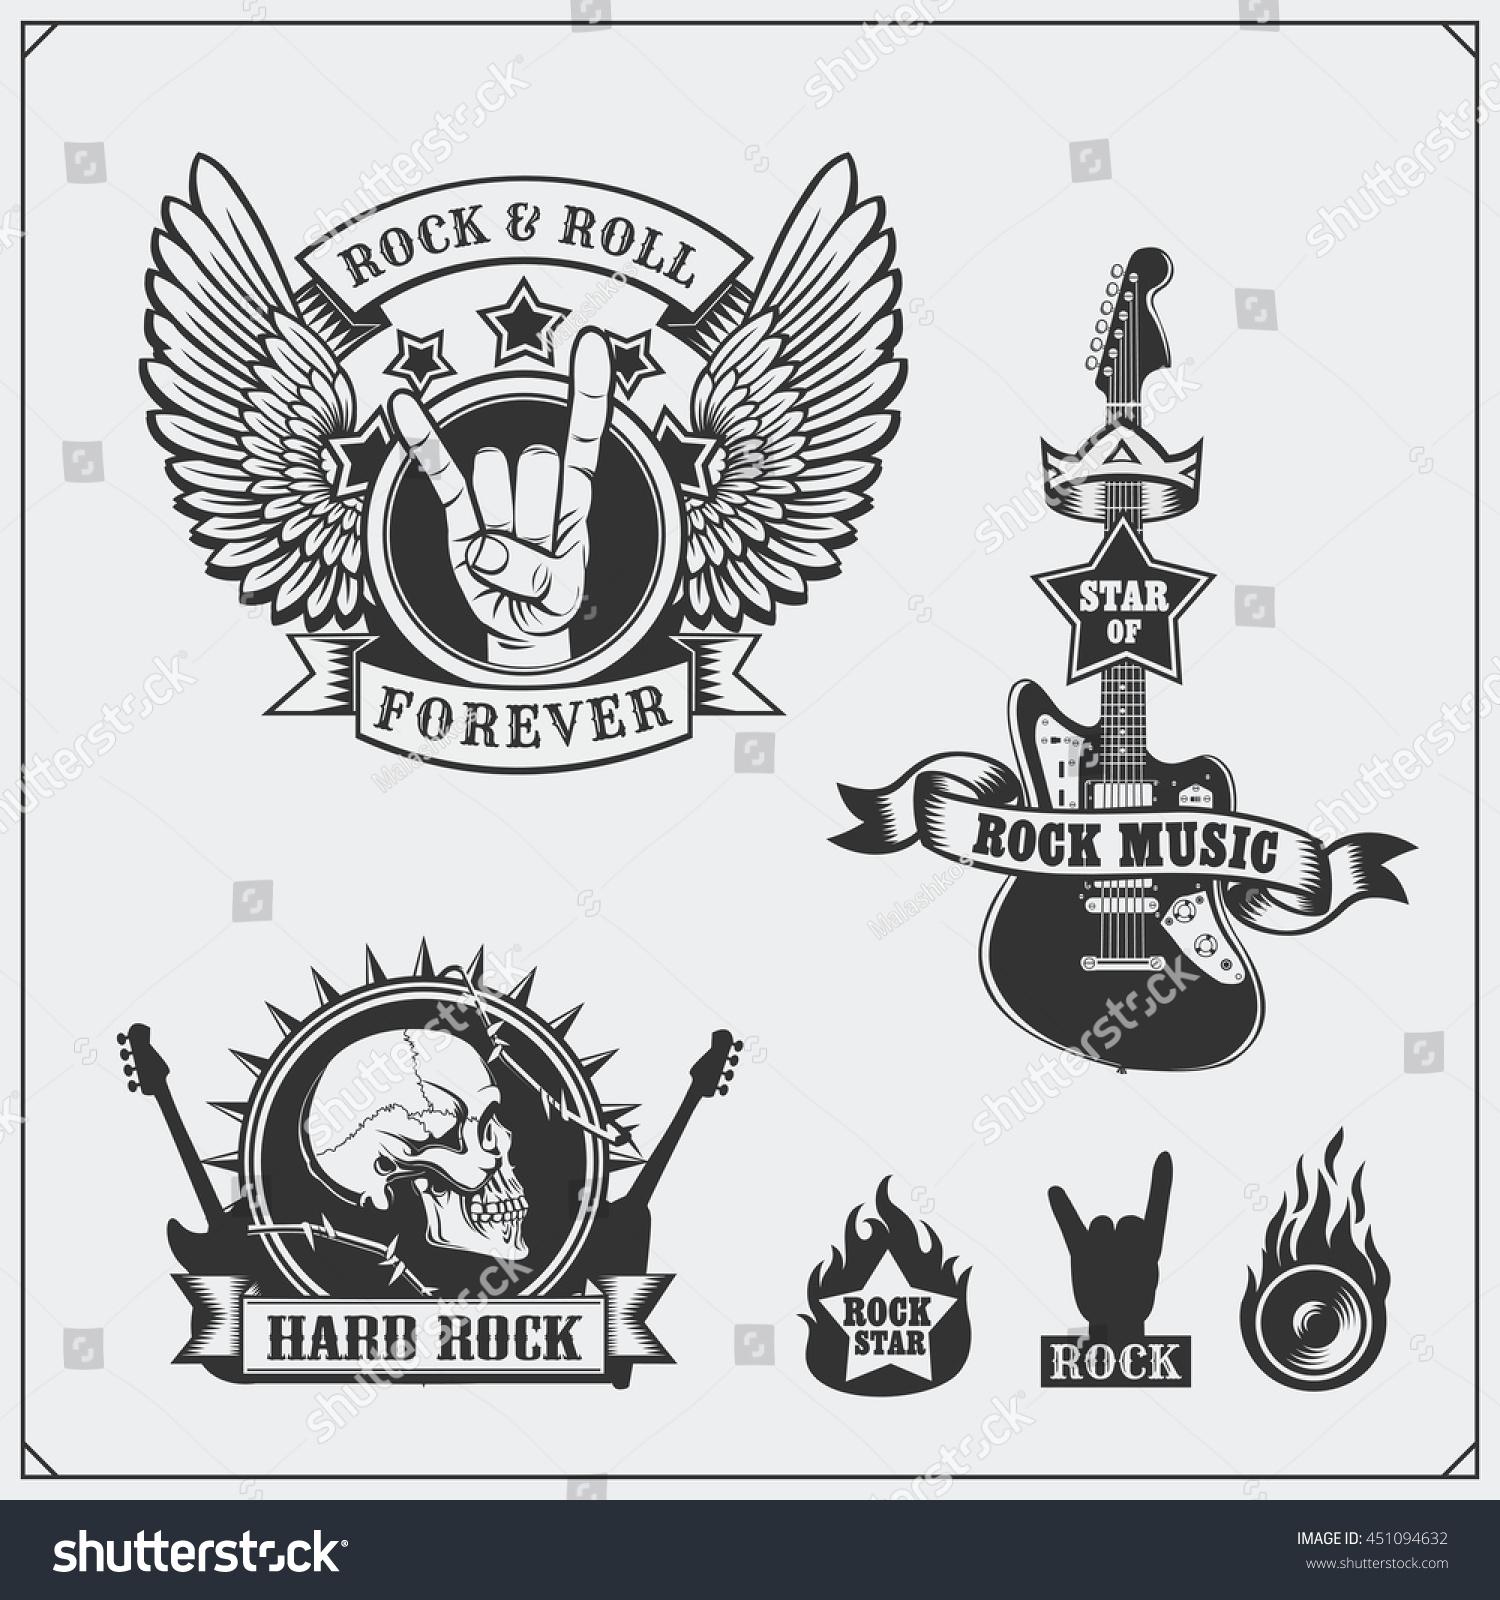 Royalty Free Rocknroll Music Symbols Labels 451094632 Stock